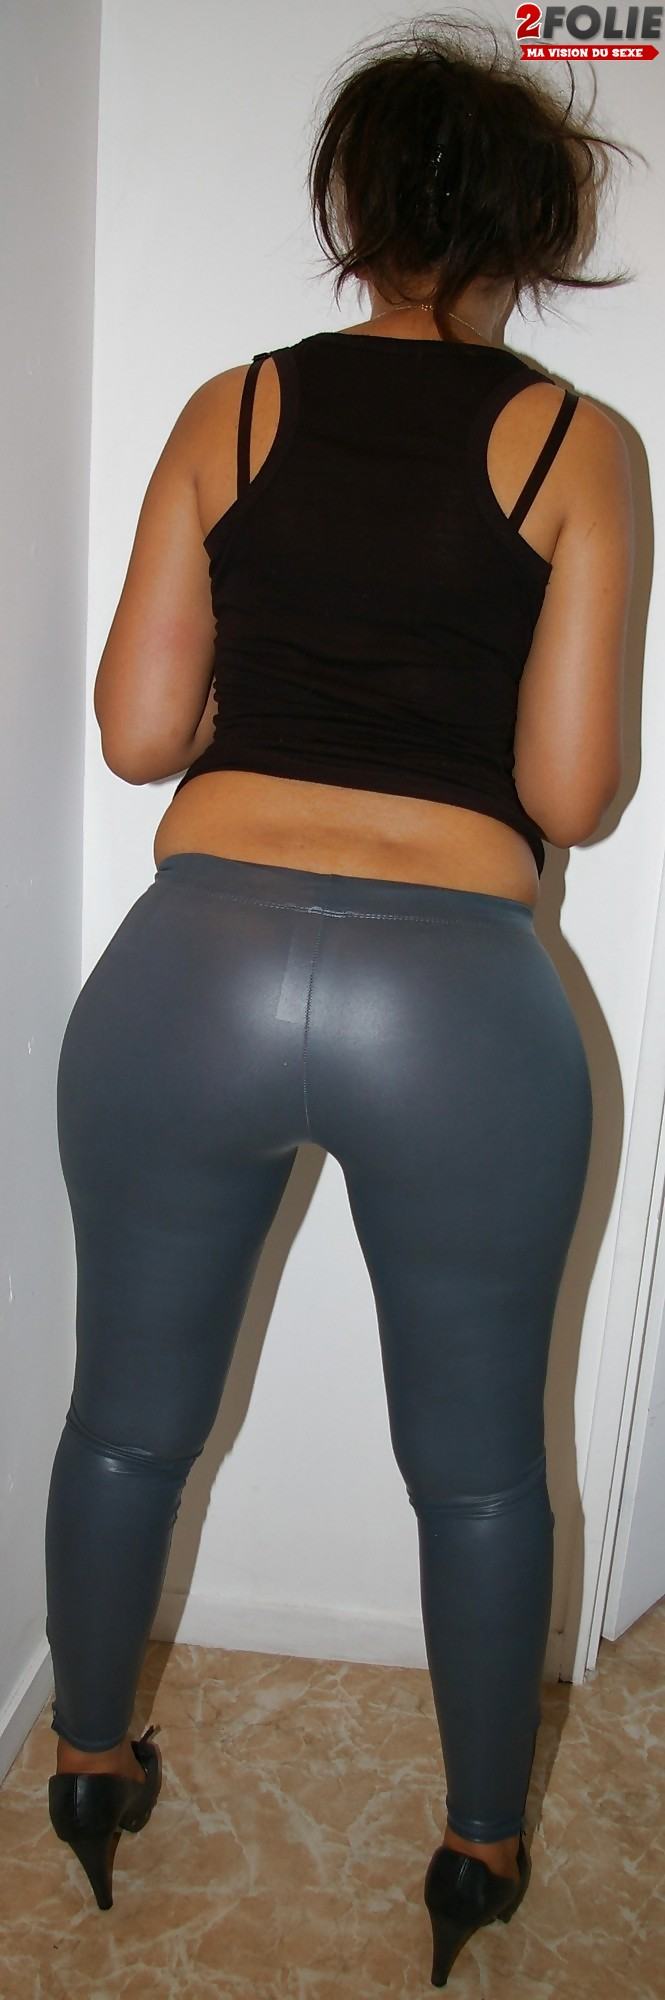 beurette legging salope de vendée